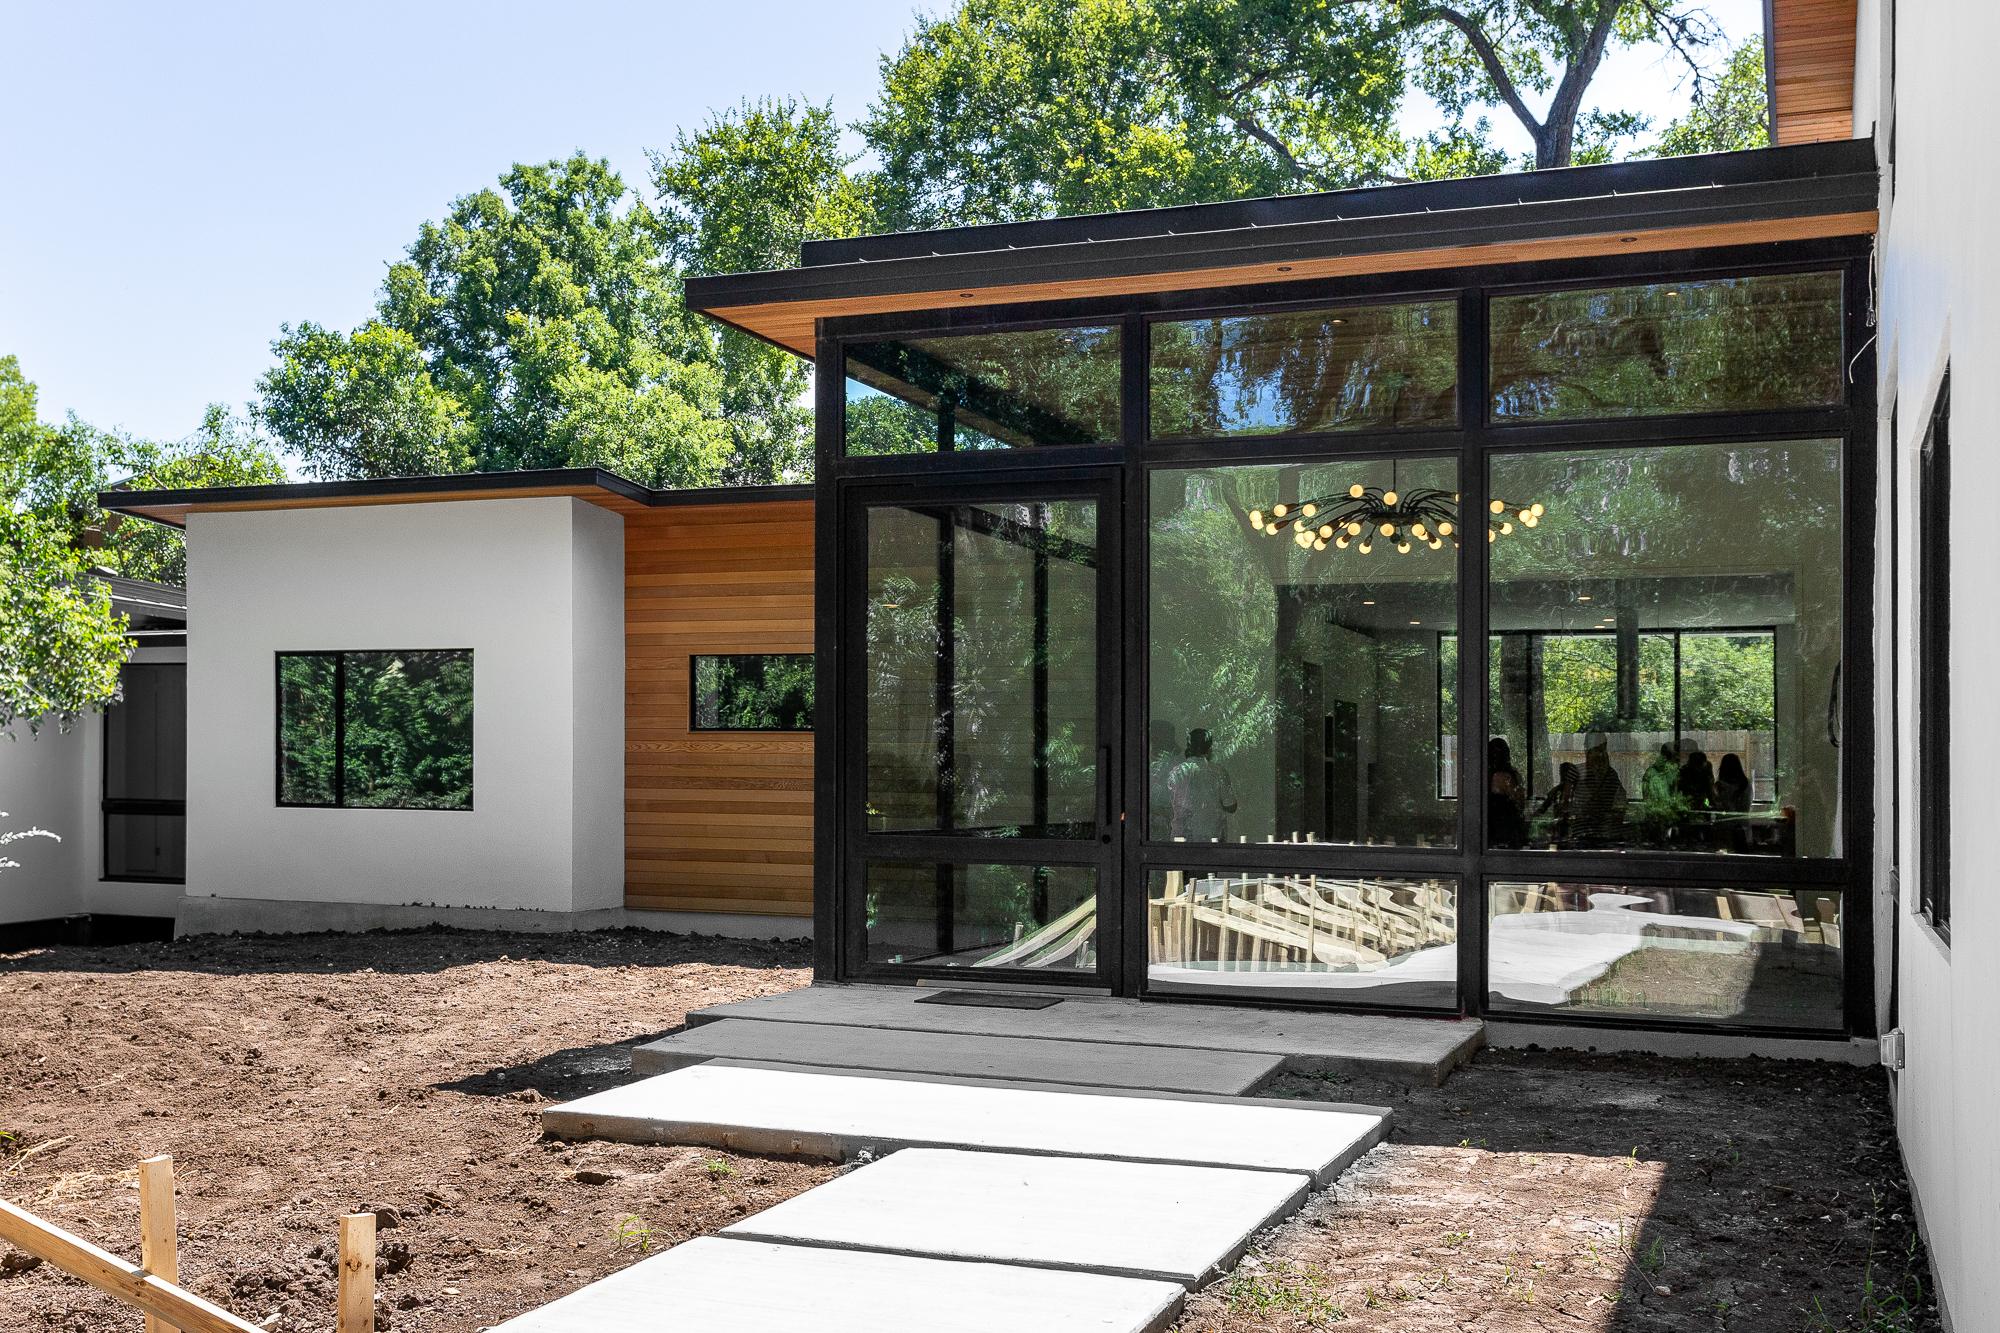 Woodridge-San-Antonio-Architecture-Photography-2.jpg